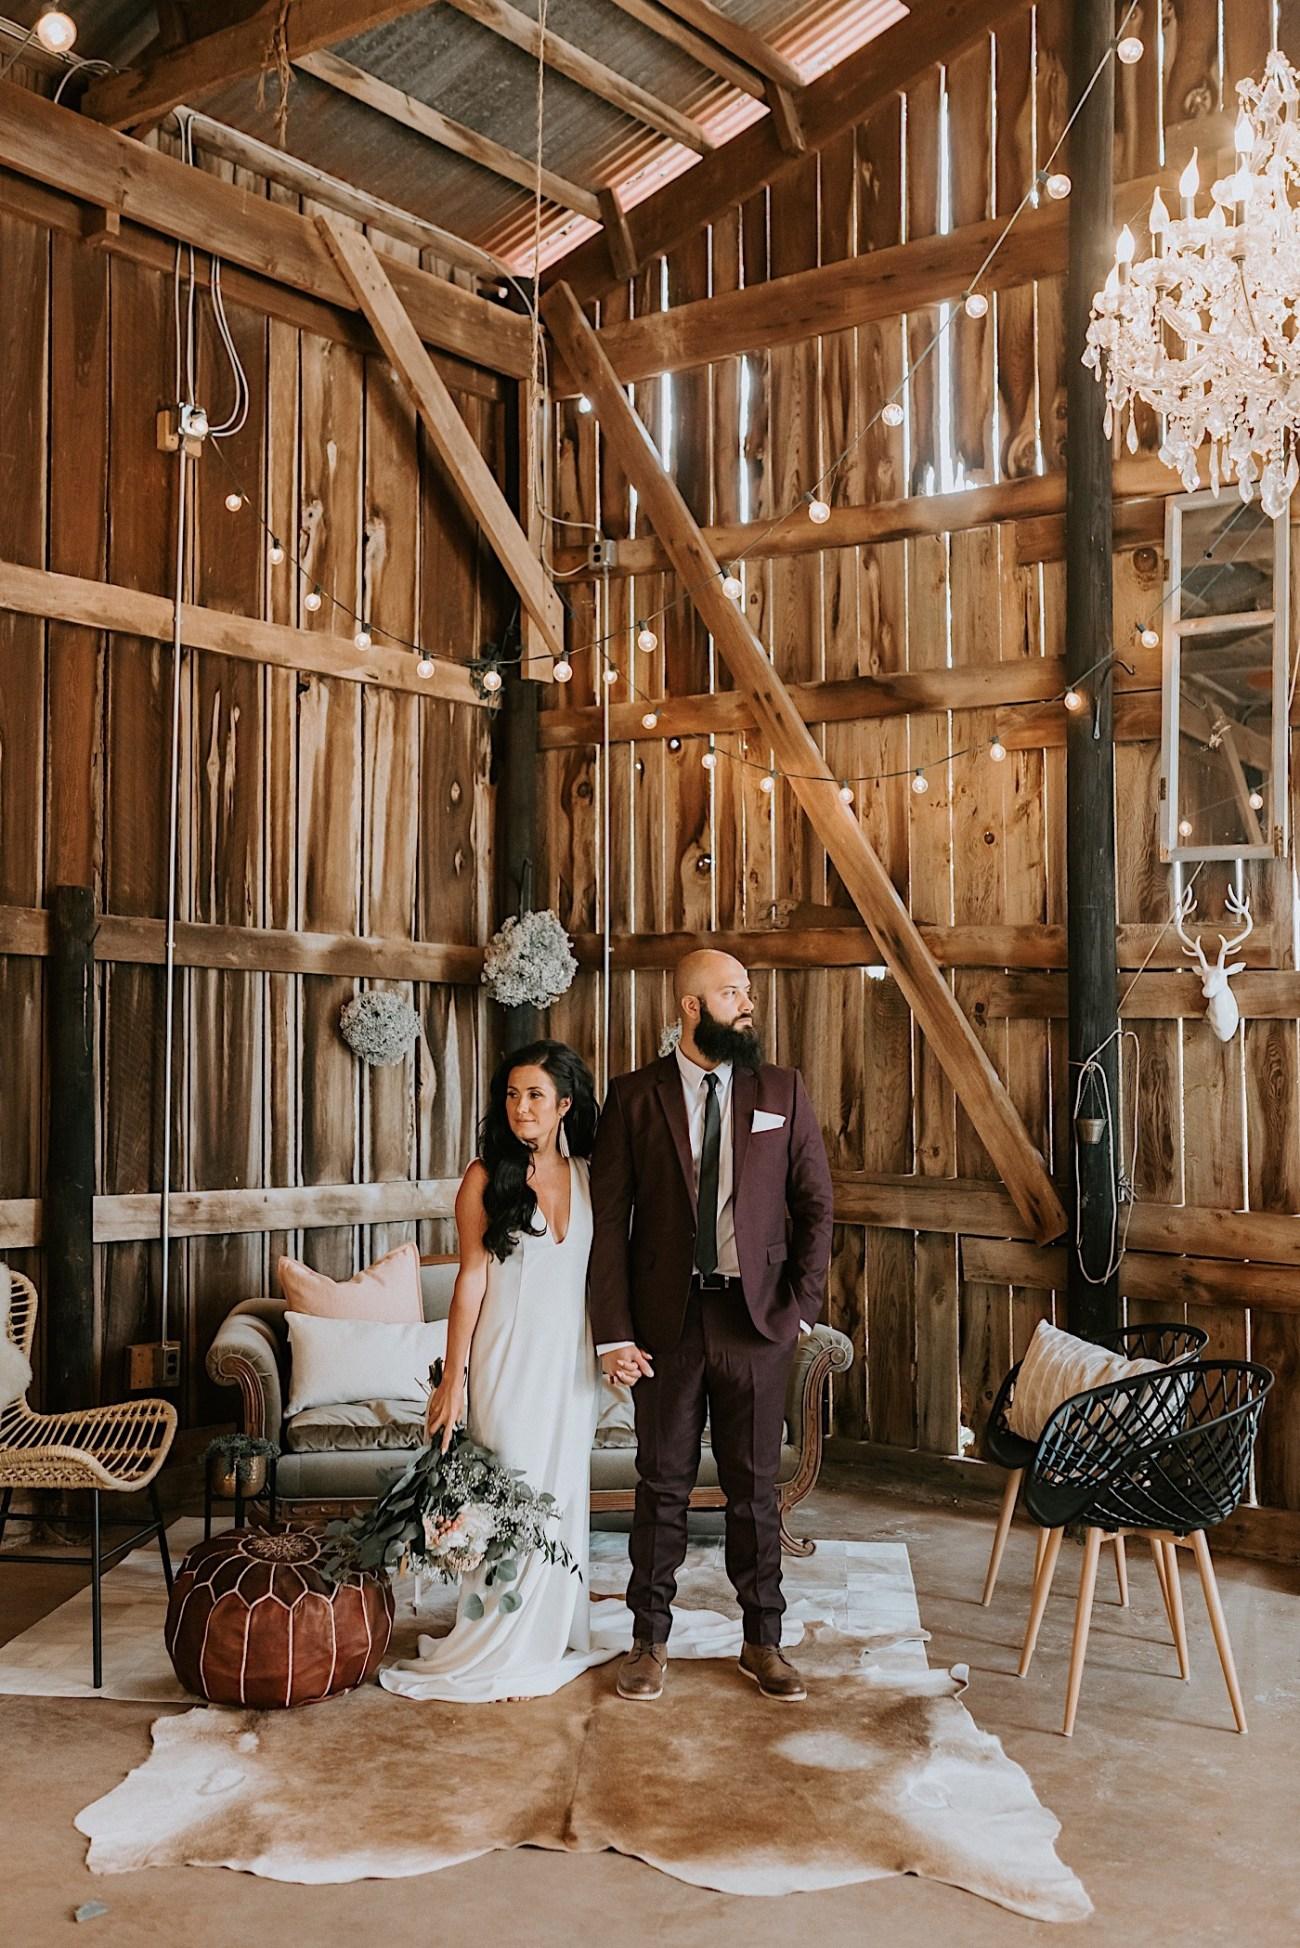 Gilbertsville Farmhouse Wedding Barn Inspiration Wedding Upstate New York Wedding Catskill Hudsonvalley Wedding 17